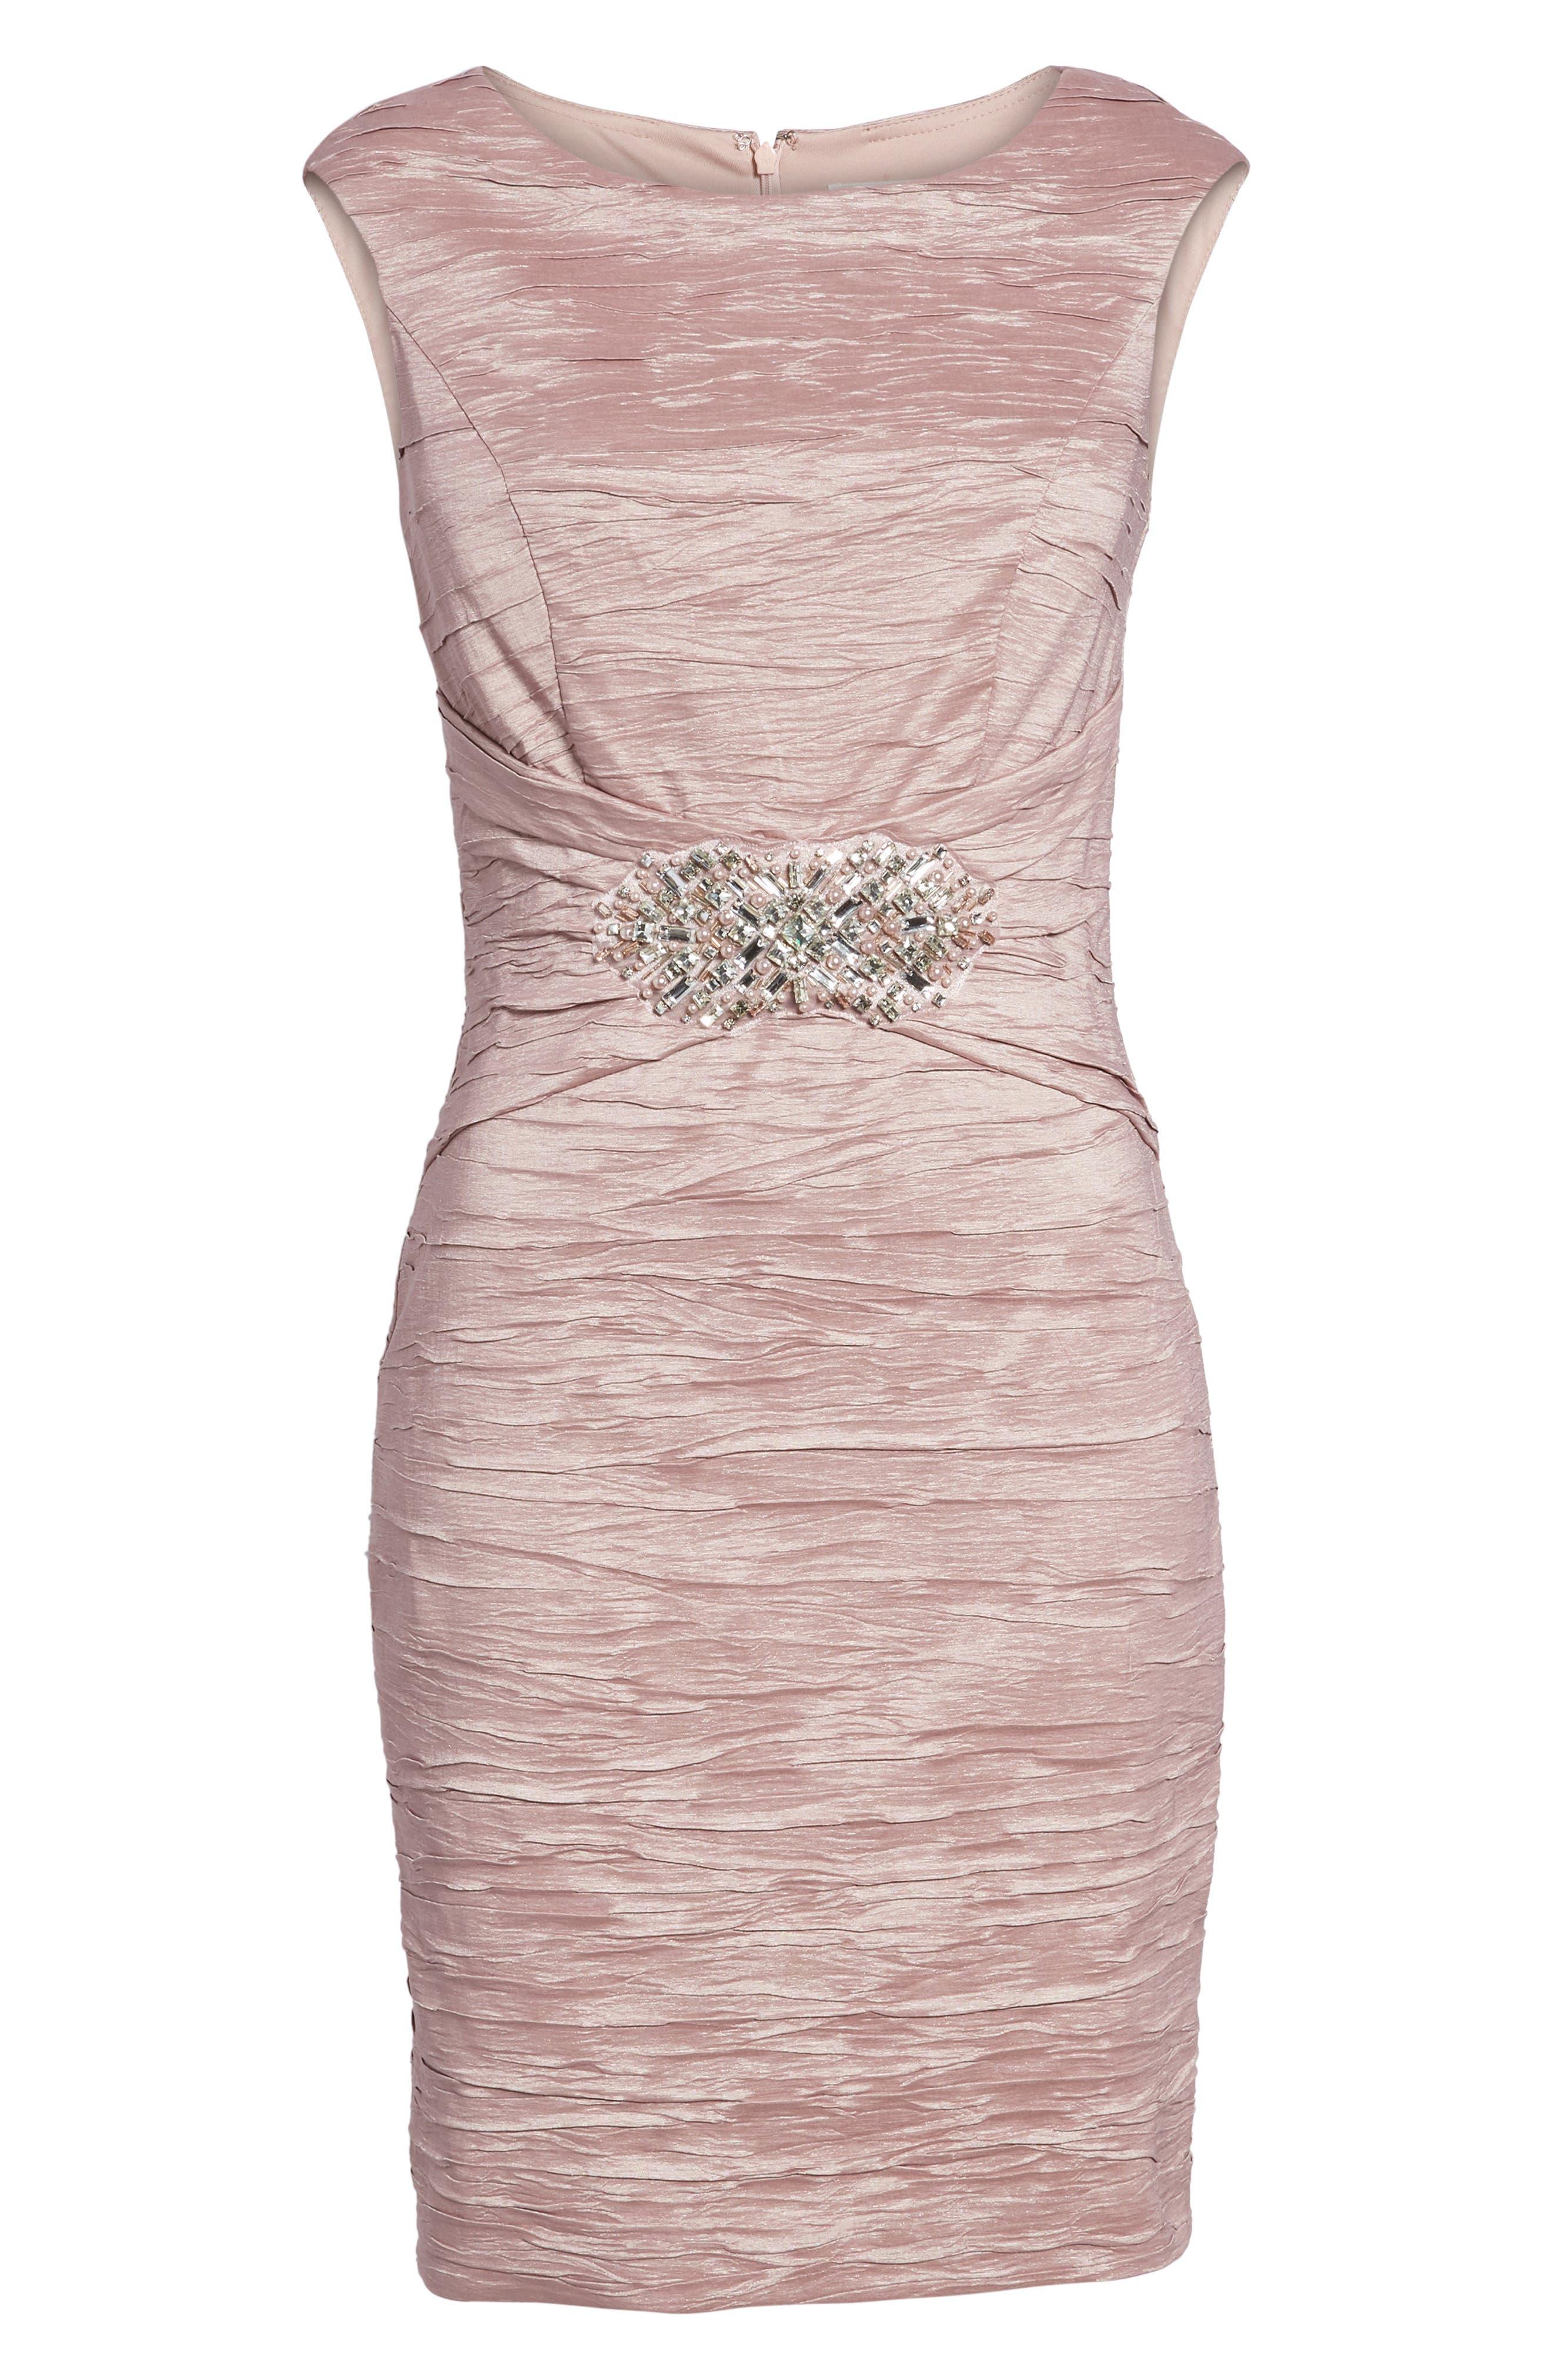 Embellished Taffeta Sheath Dress,                             Alternate thumbnail 6, color,